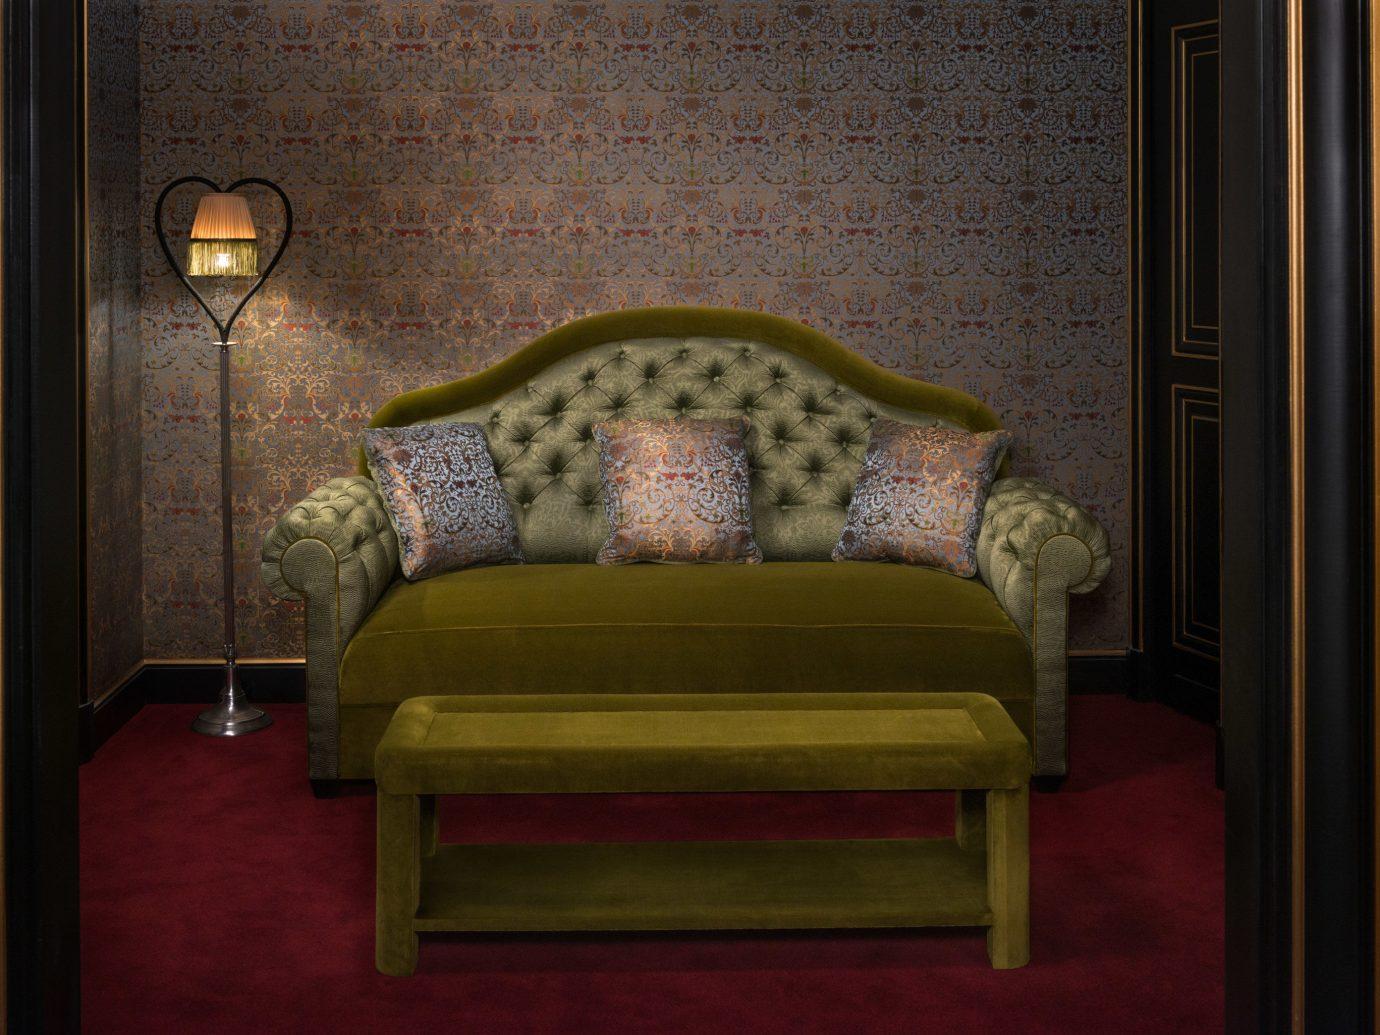 France Hotels Paris indoor wall floor room furniture living room interior design chair Design Bedroom